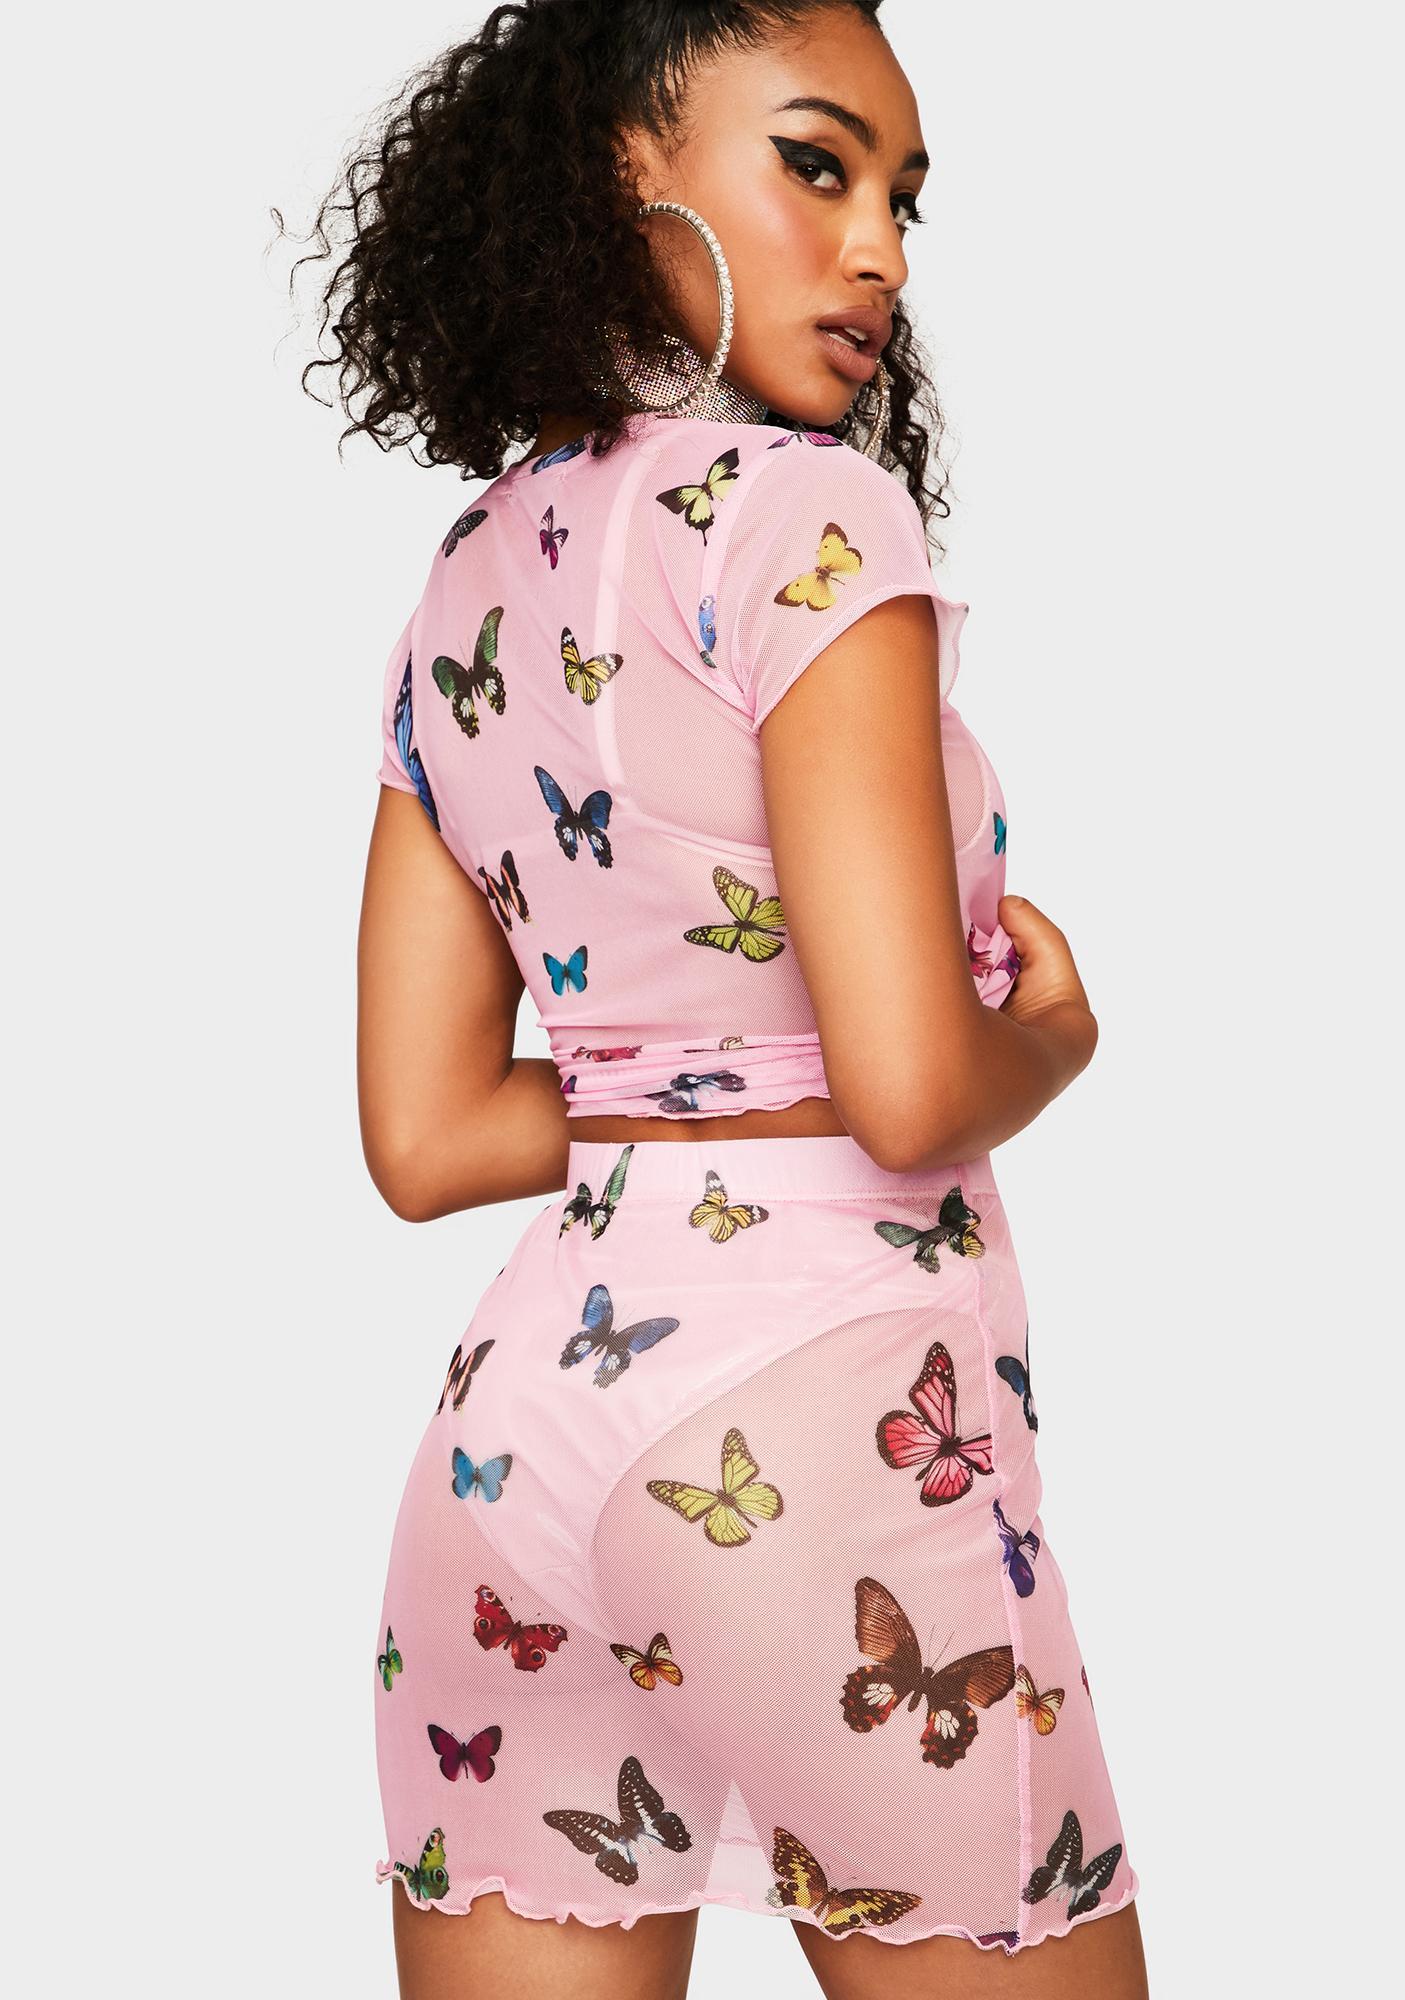 Butterfly Fly Away Mesh Skirt